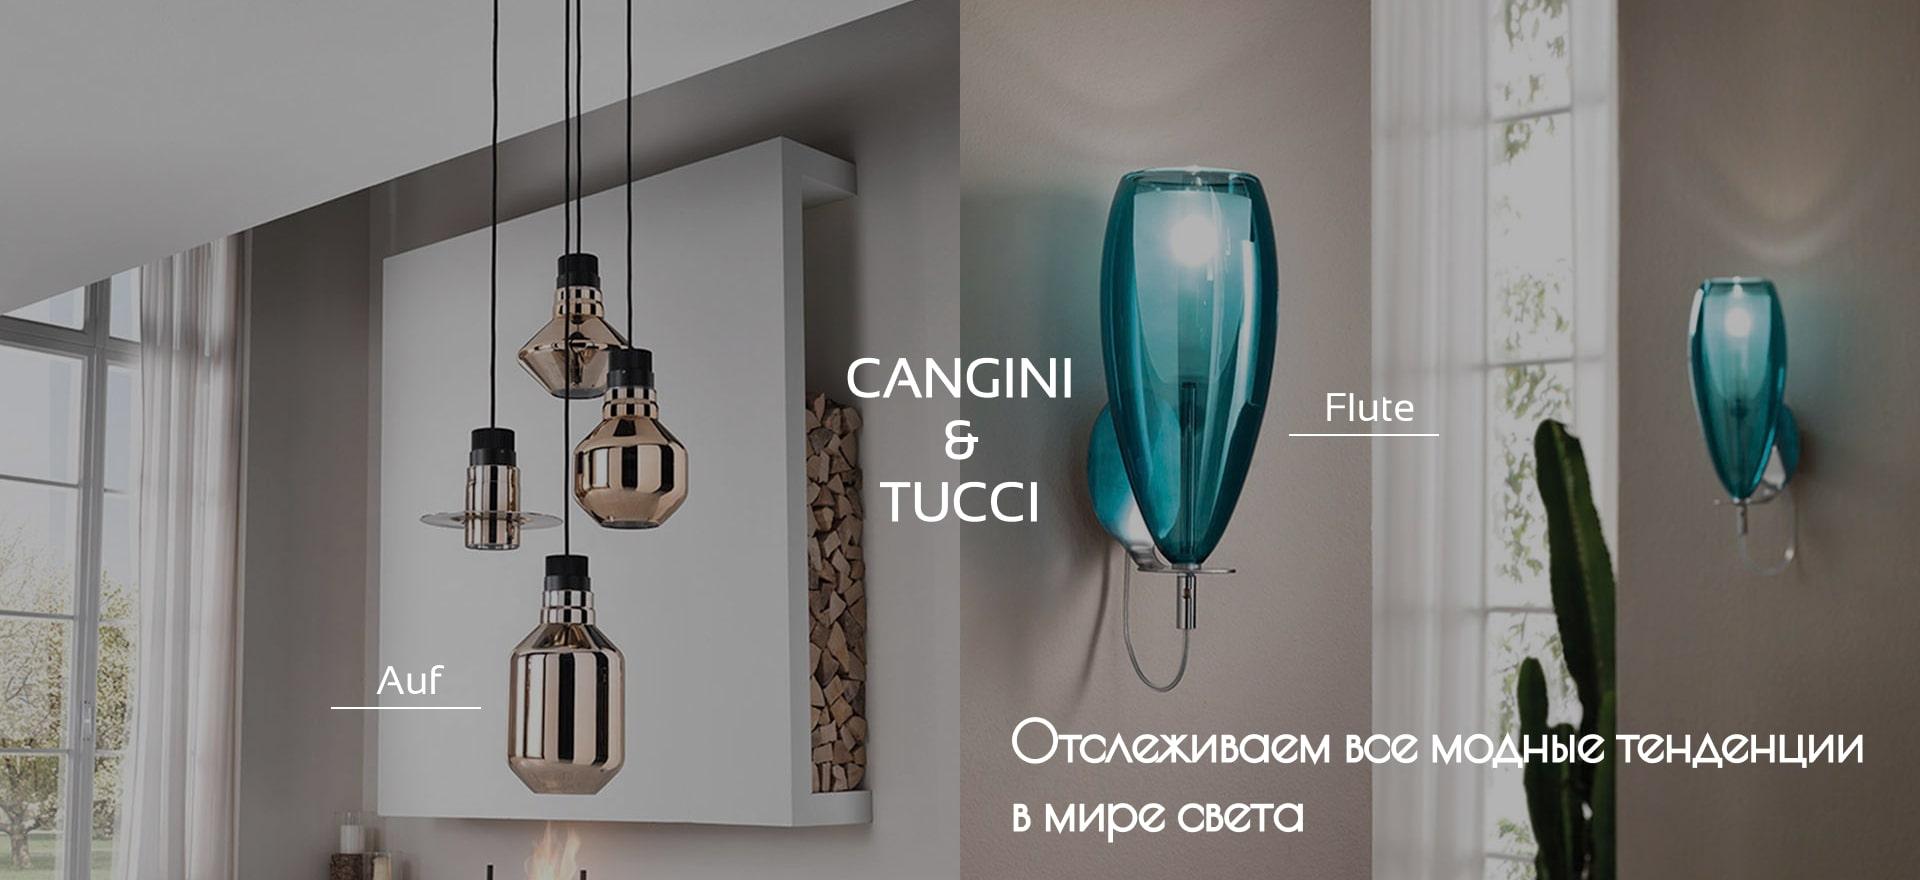 slider-cangini-tucci